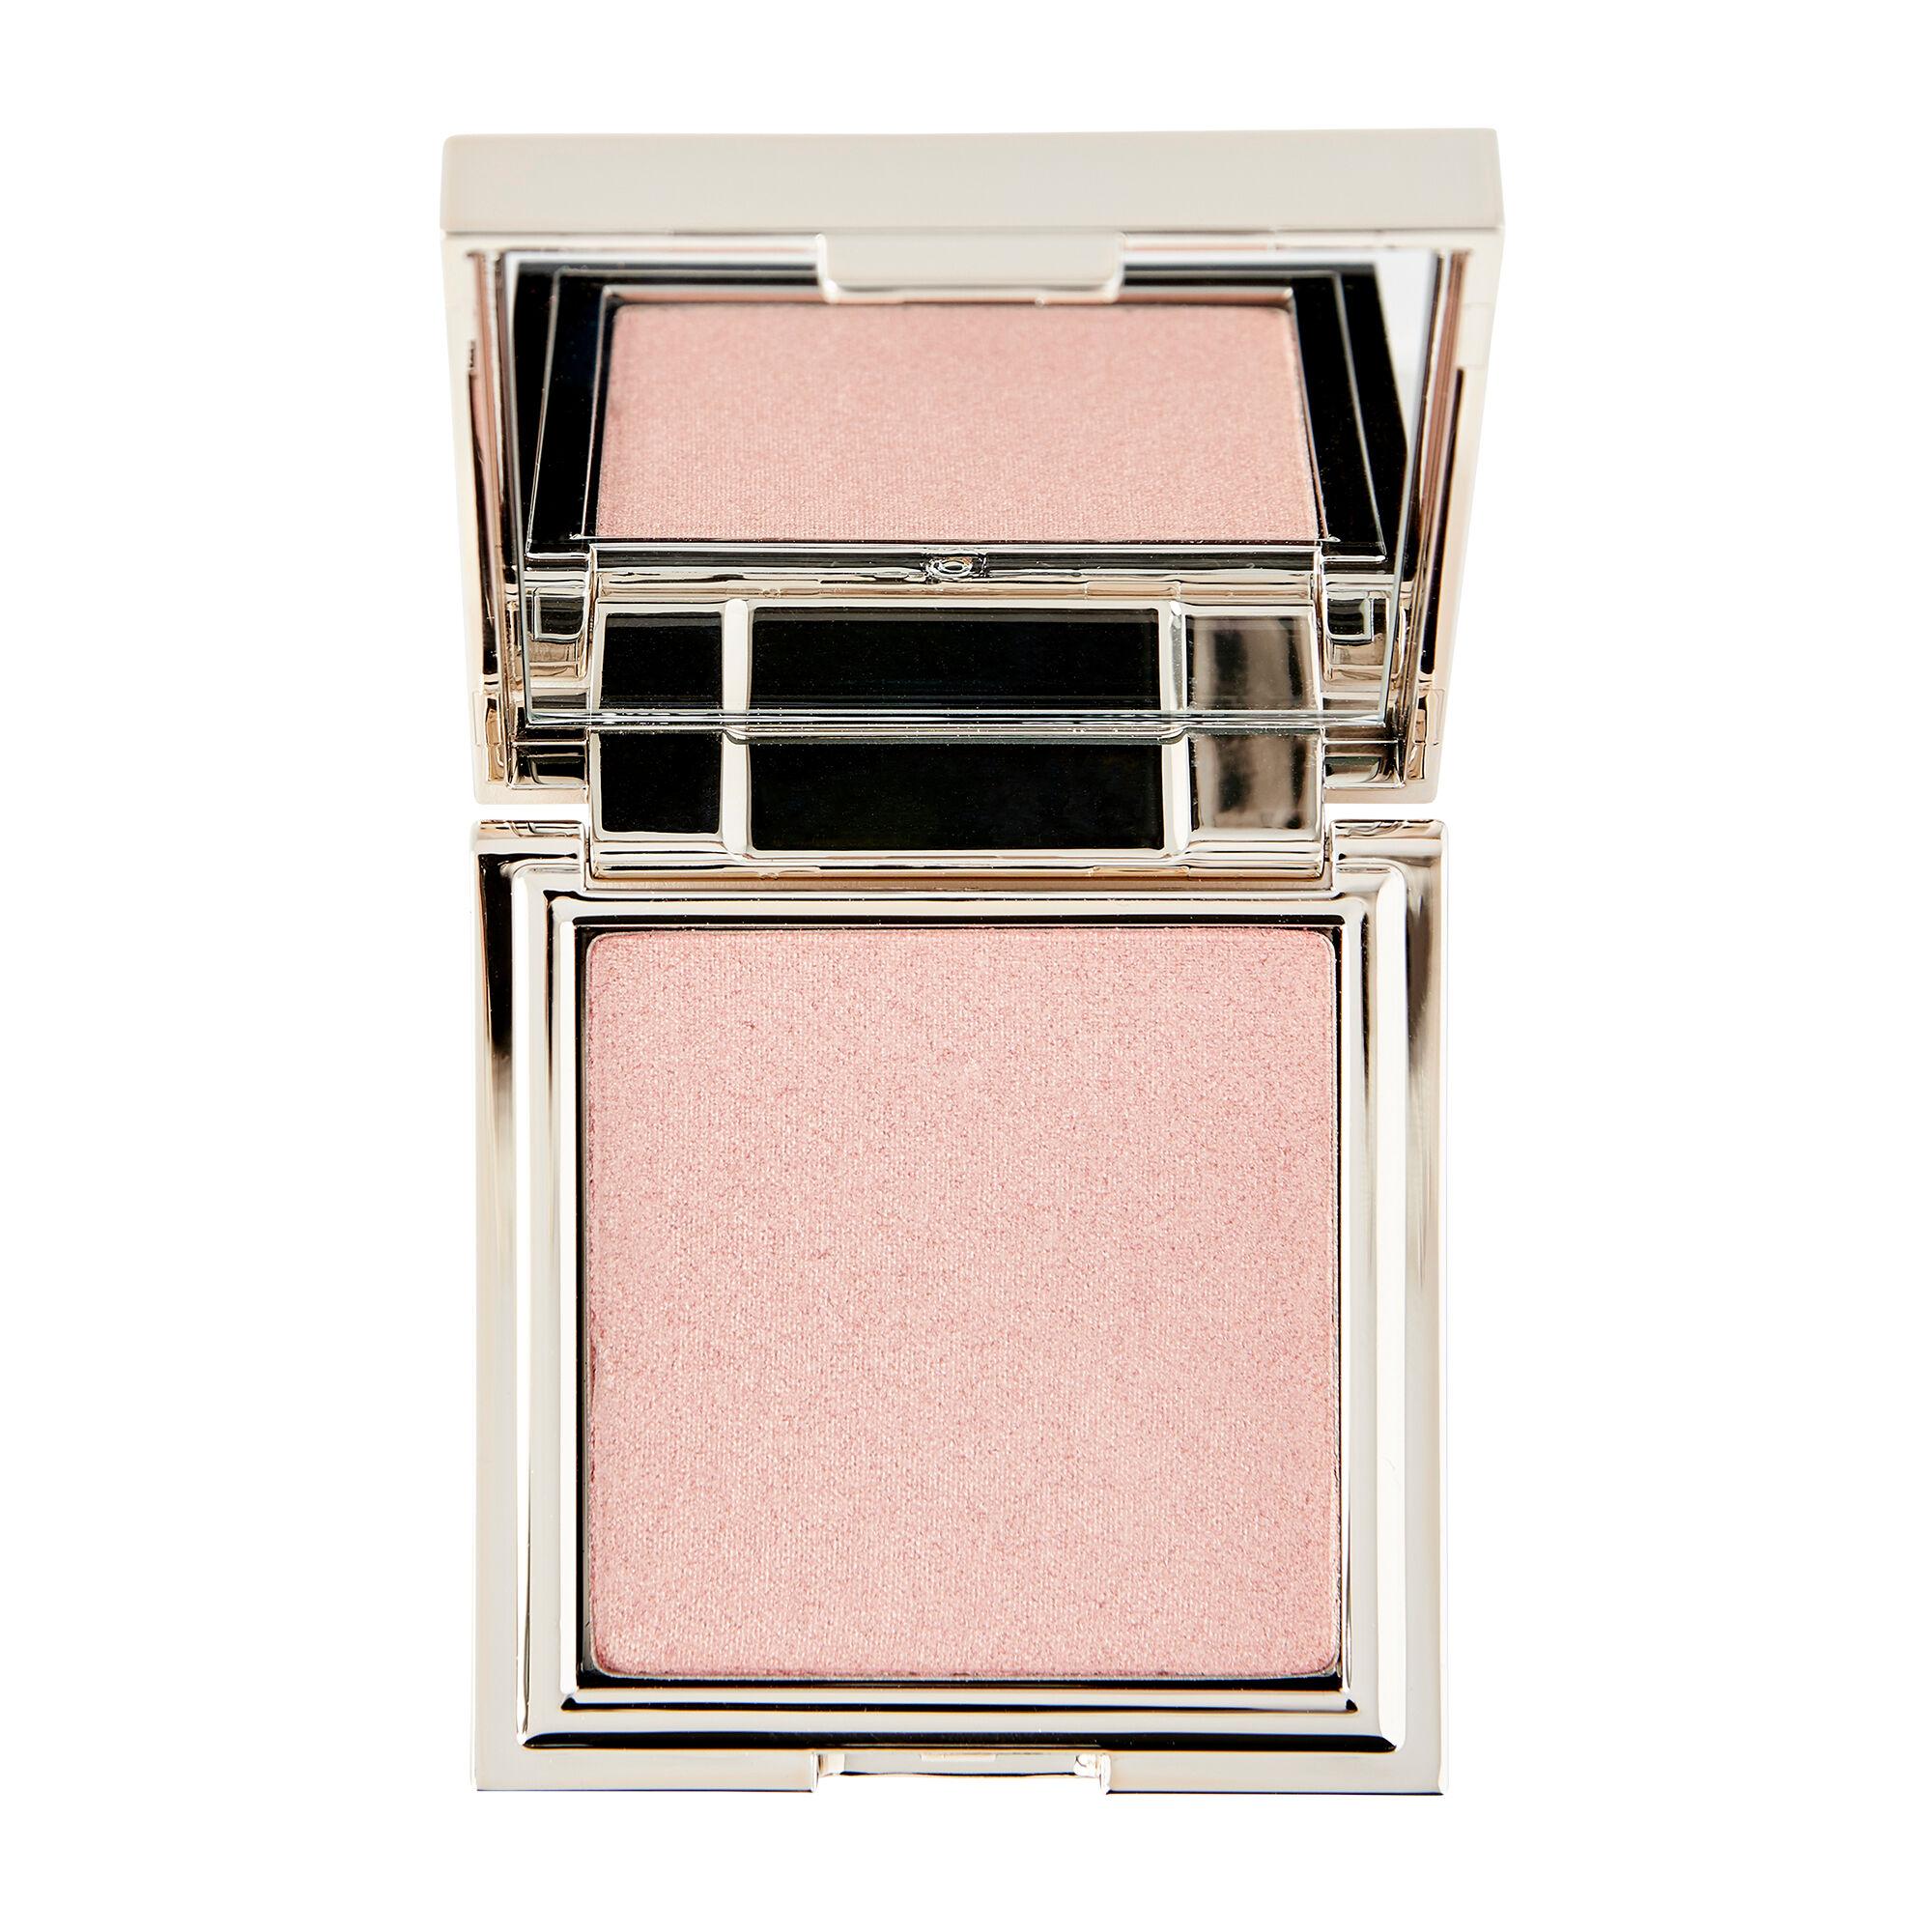 Jouer Cosmetics Powder Highlighter Rose Quartz 4.5g